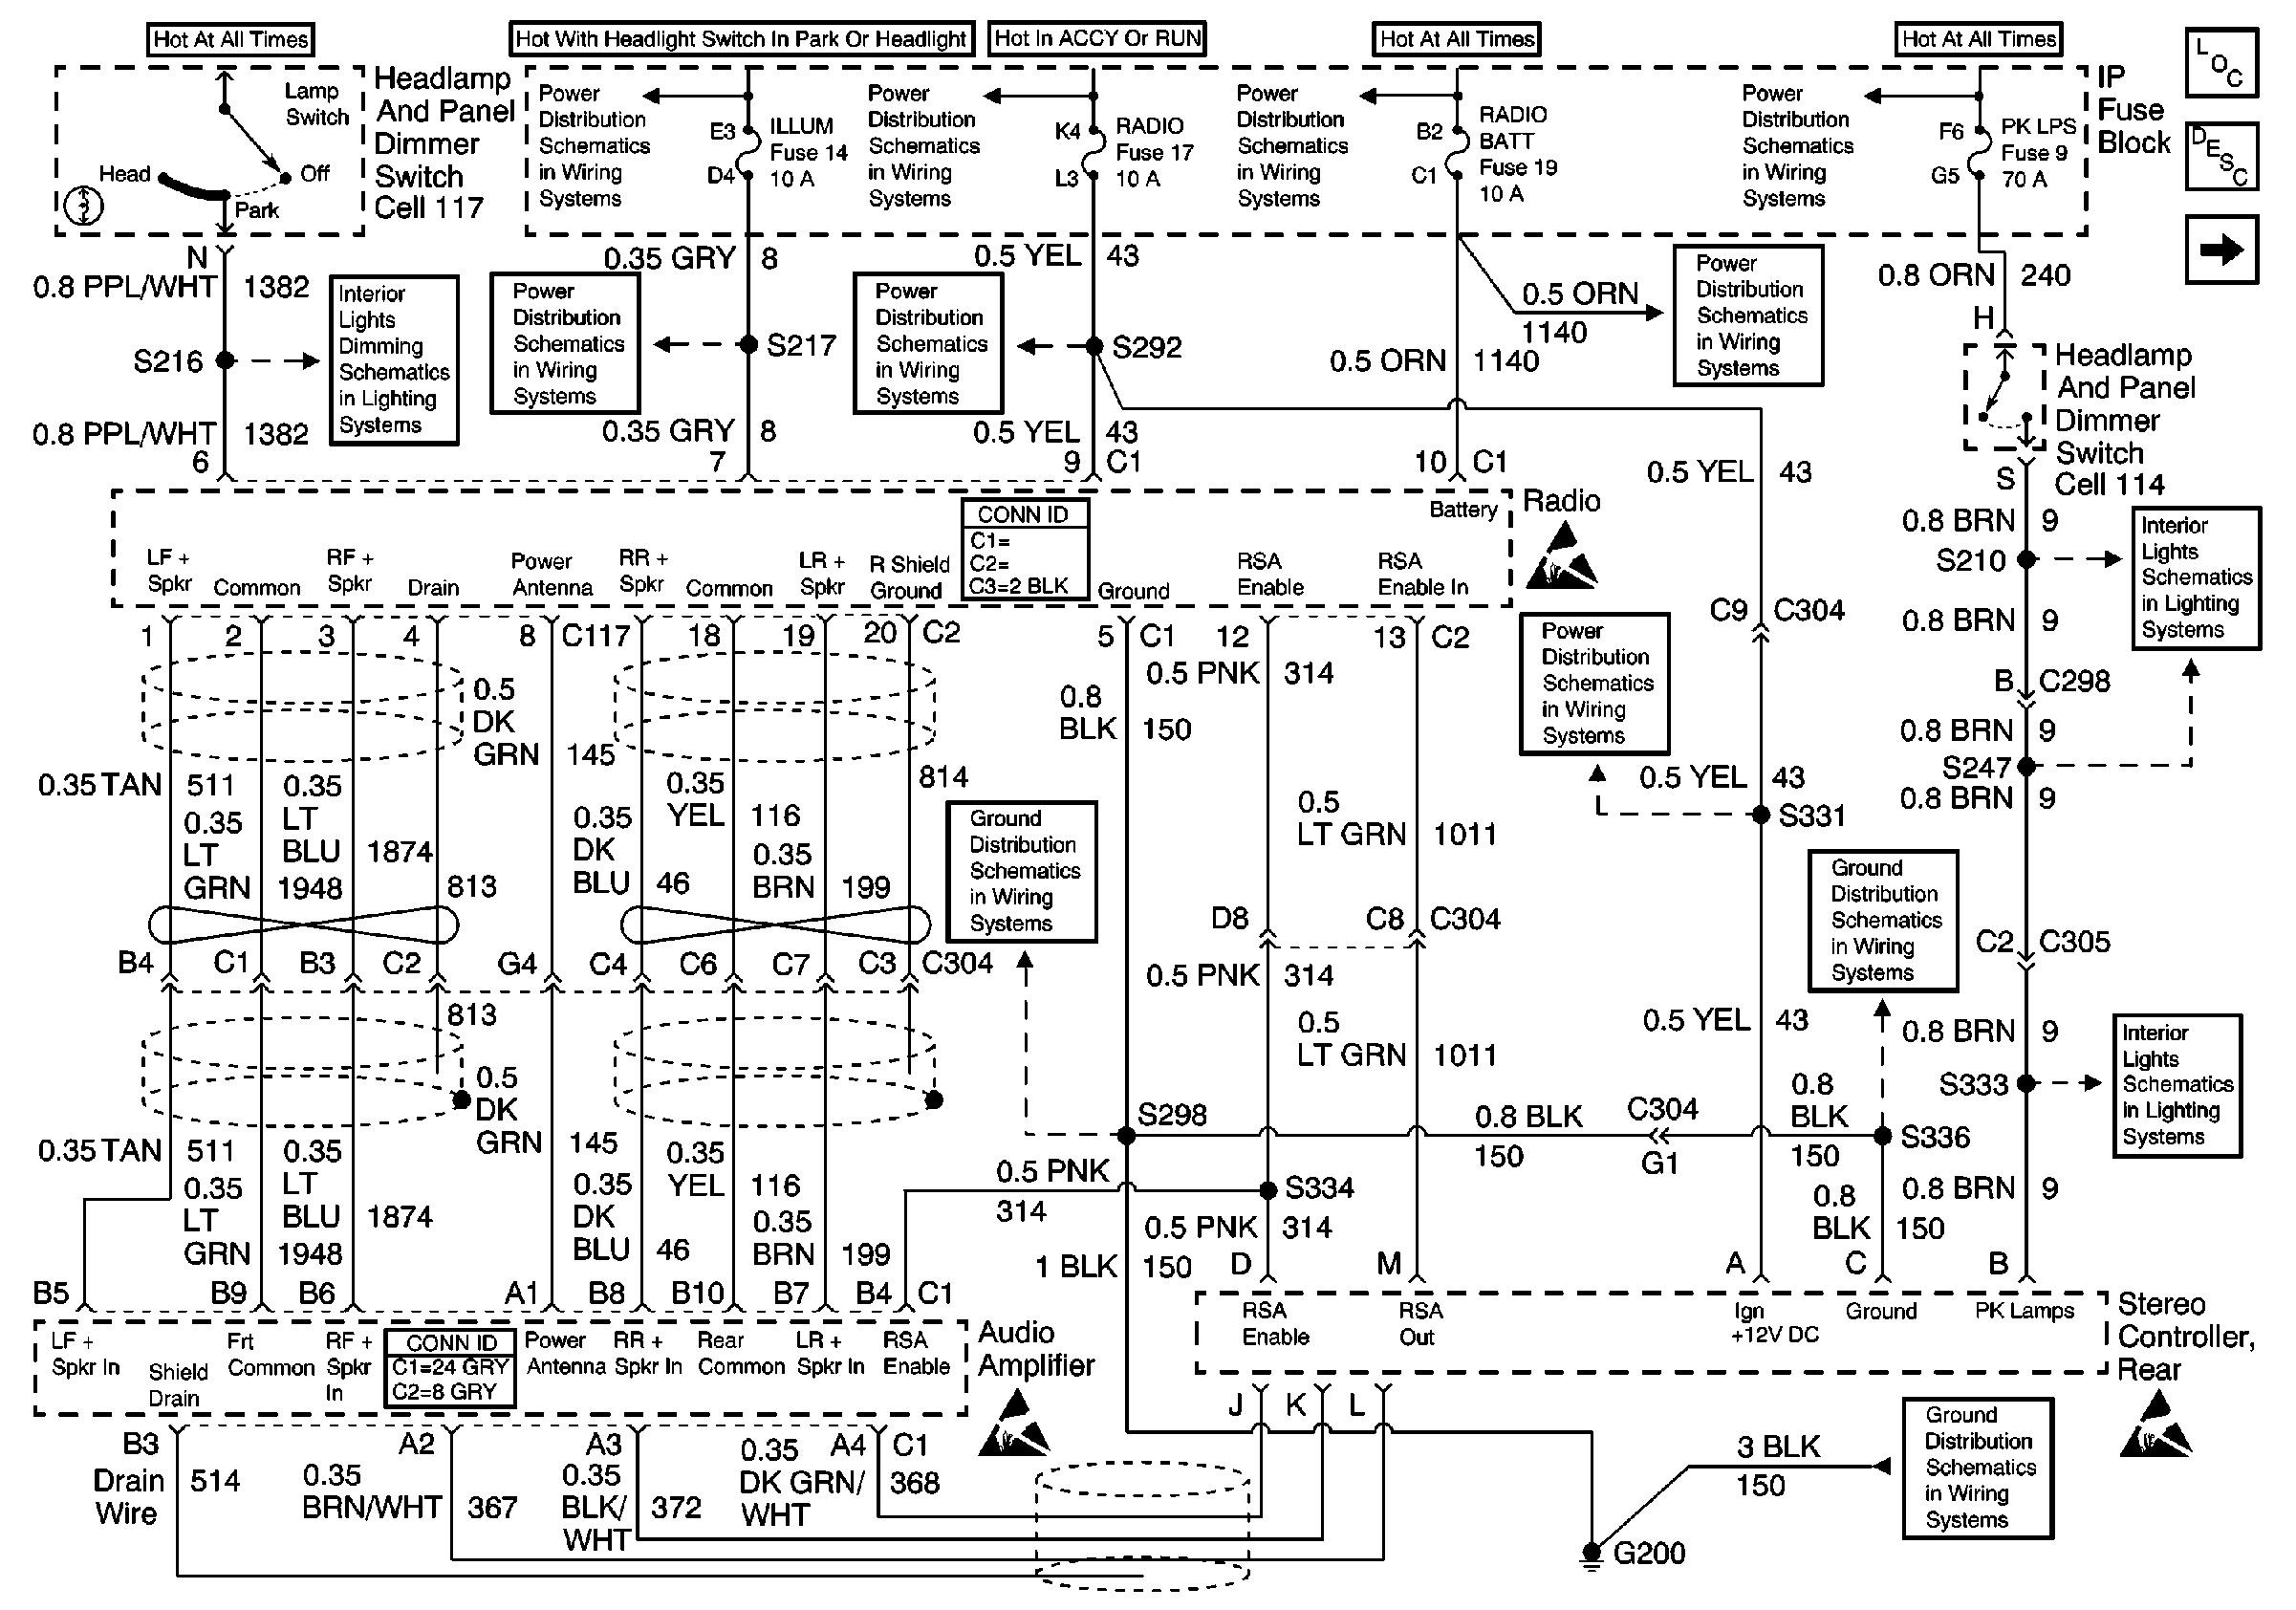 wiring diagram for cadillac srx - tank motorcycle wiring diagram for wiring  diagram schematics  wiring diagram schematics